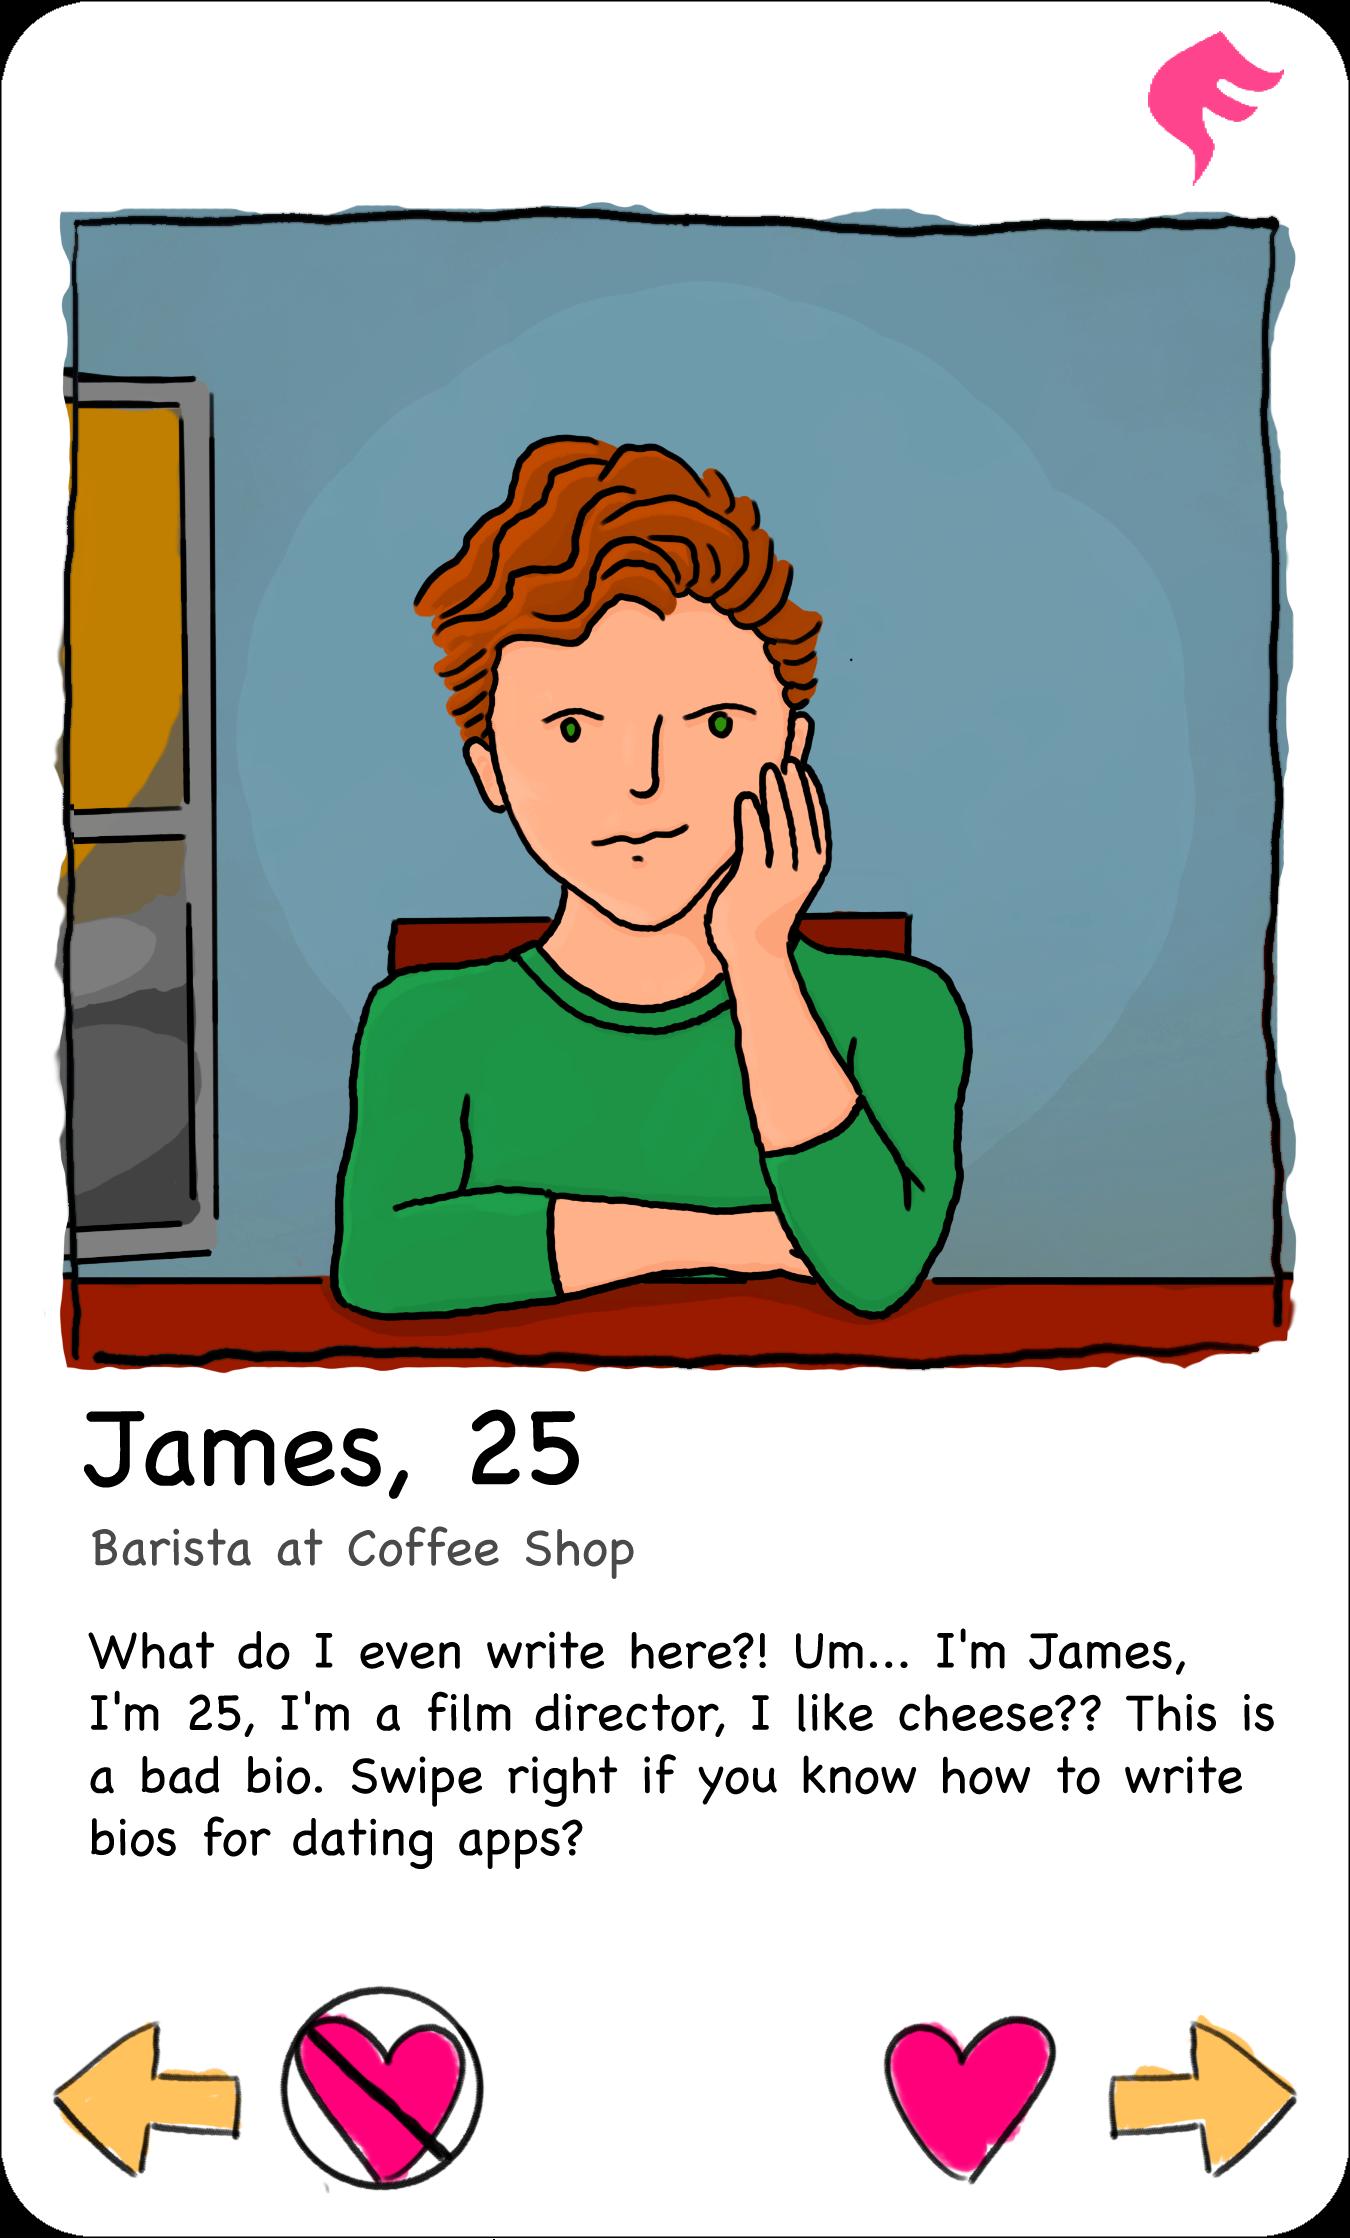 fyr_profile_james.png